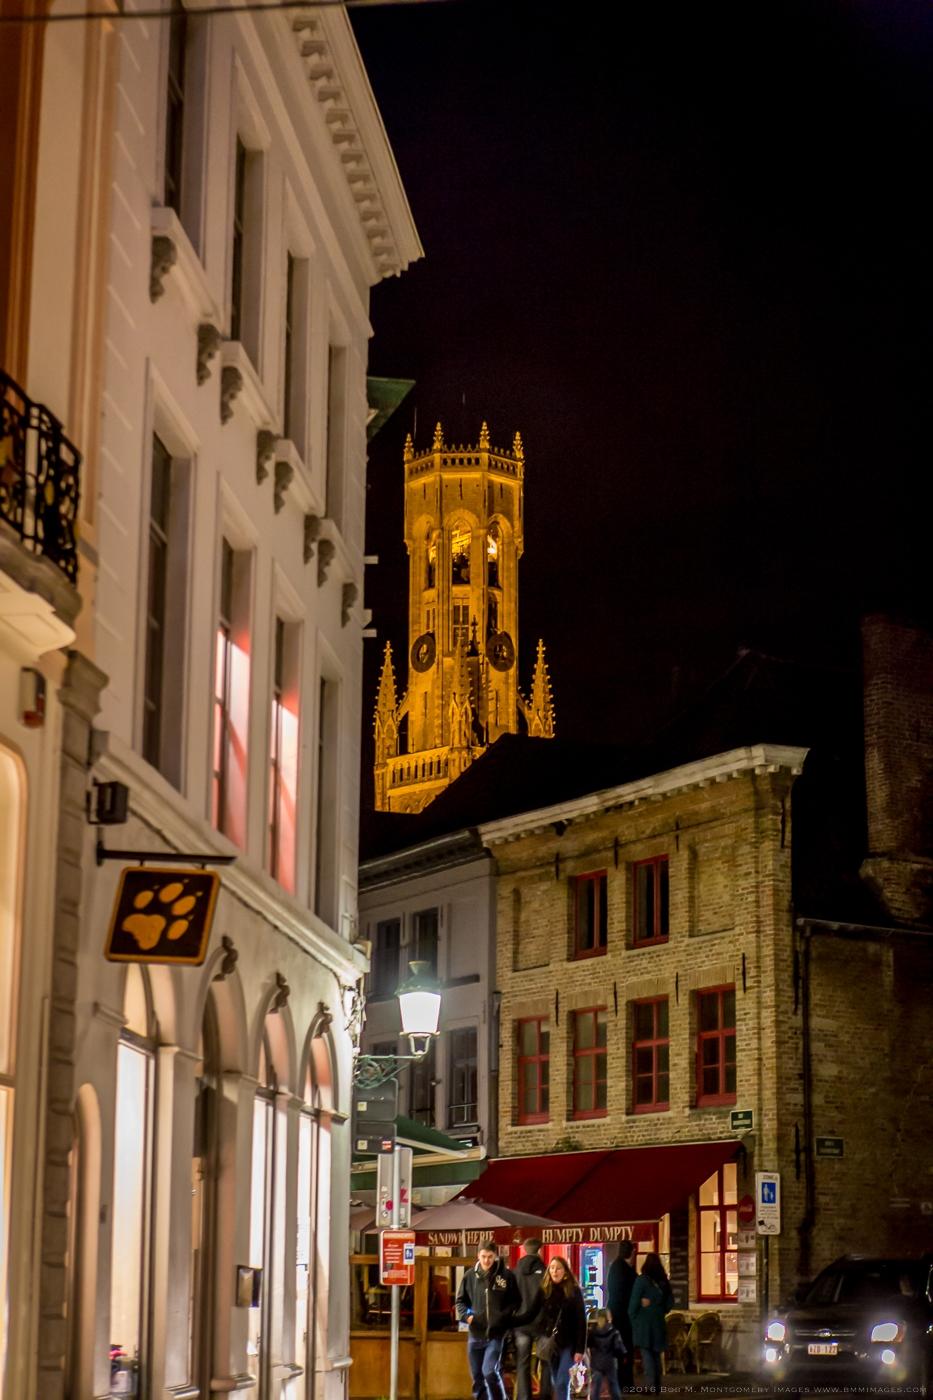 Belgium 20121103 - 0010.jpg